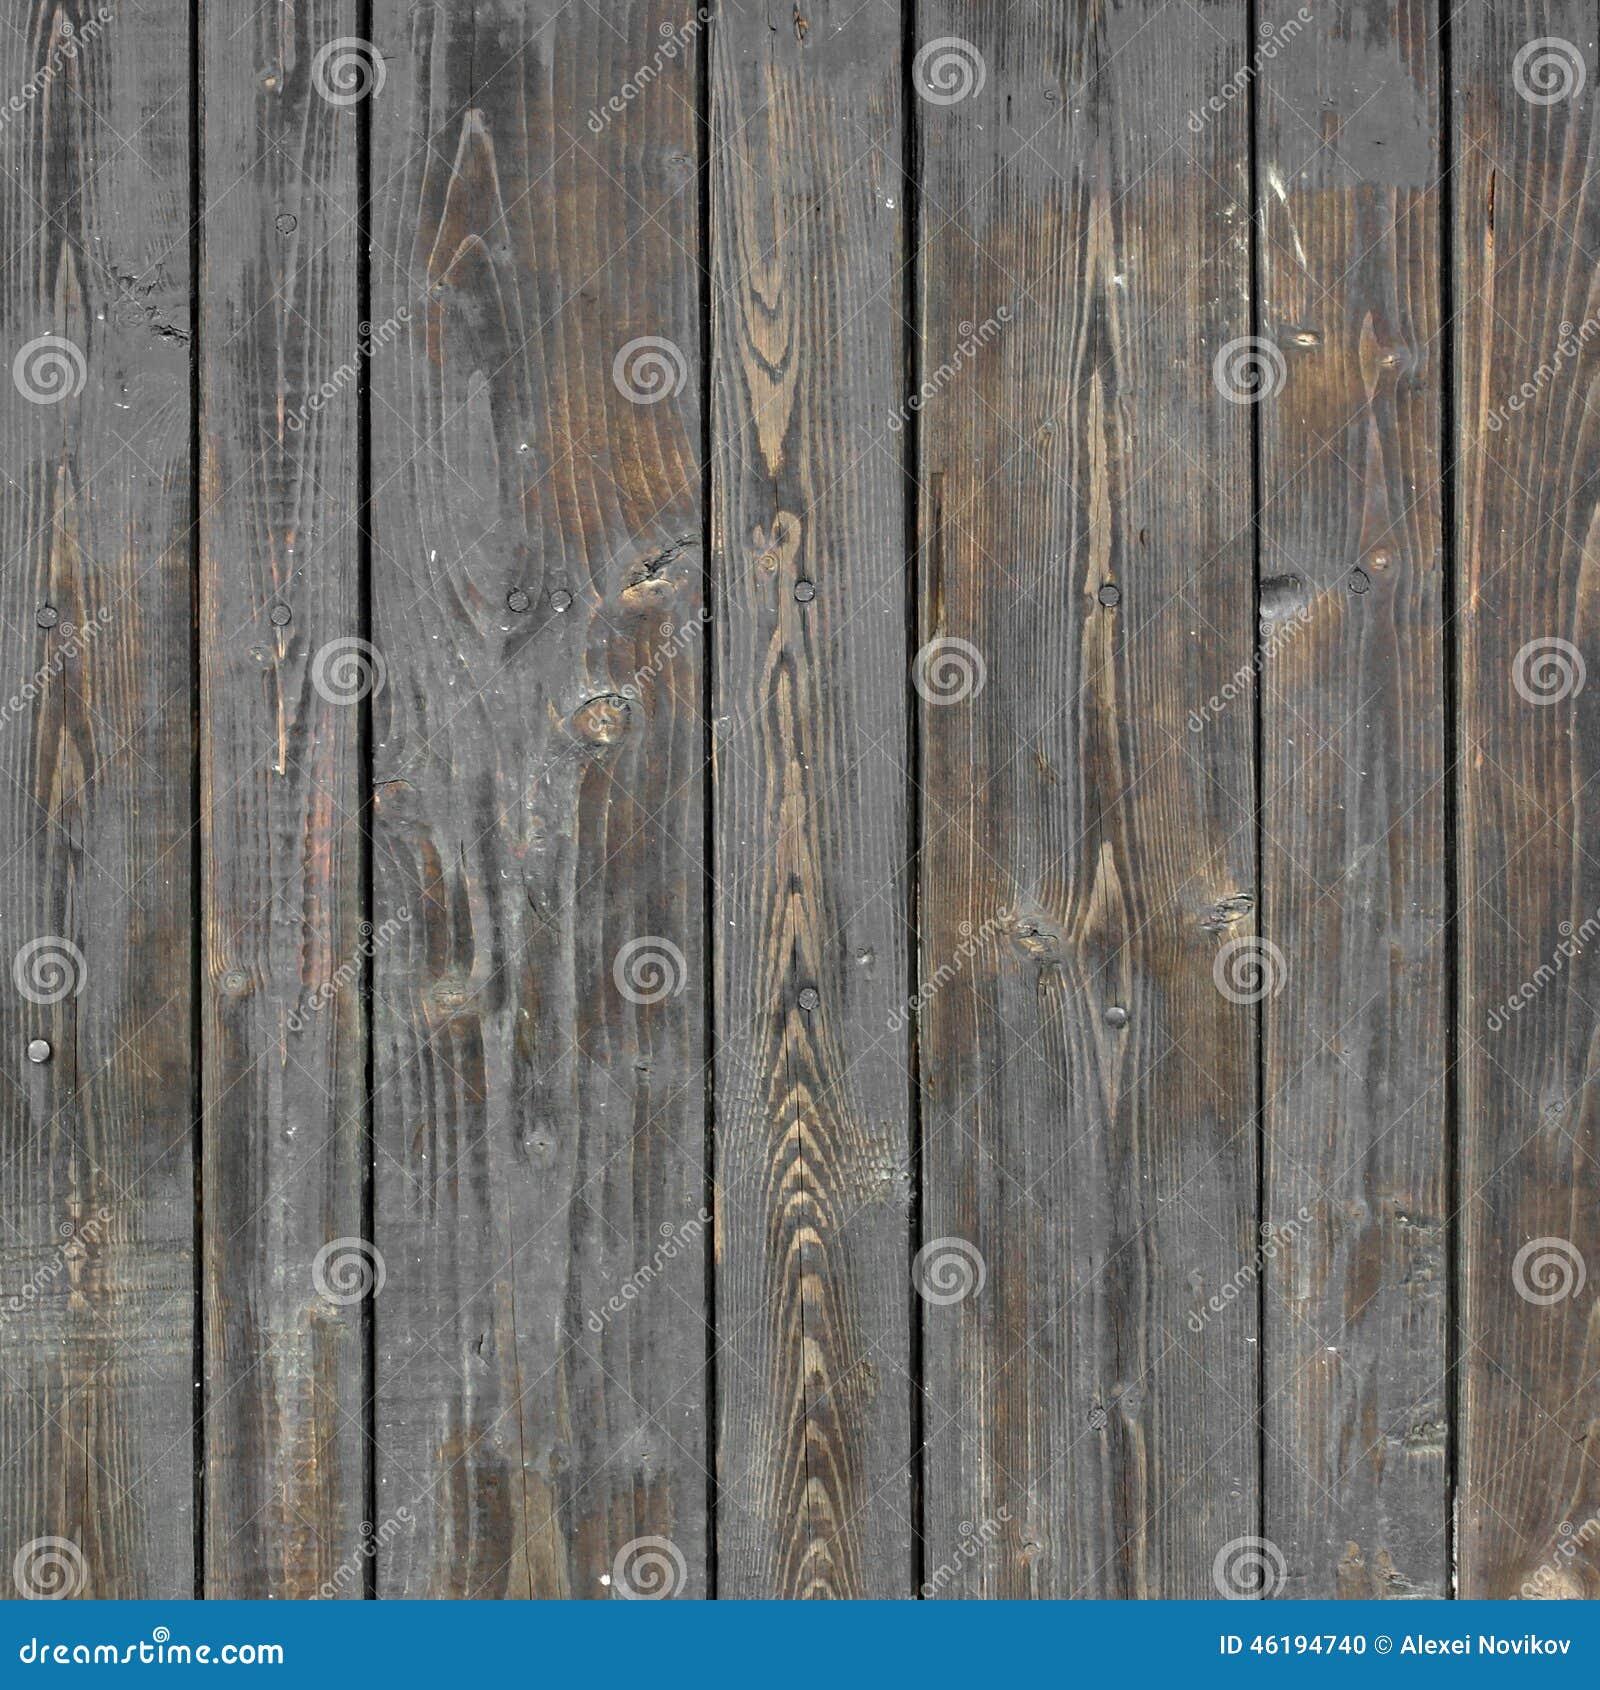 Old Wood Flat Plank Panel Stock Photo Image 46194740